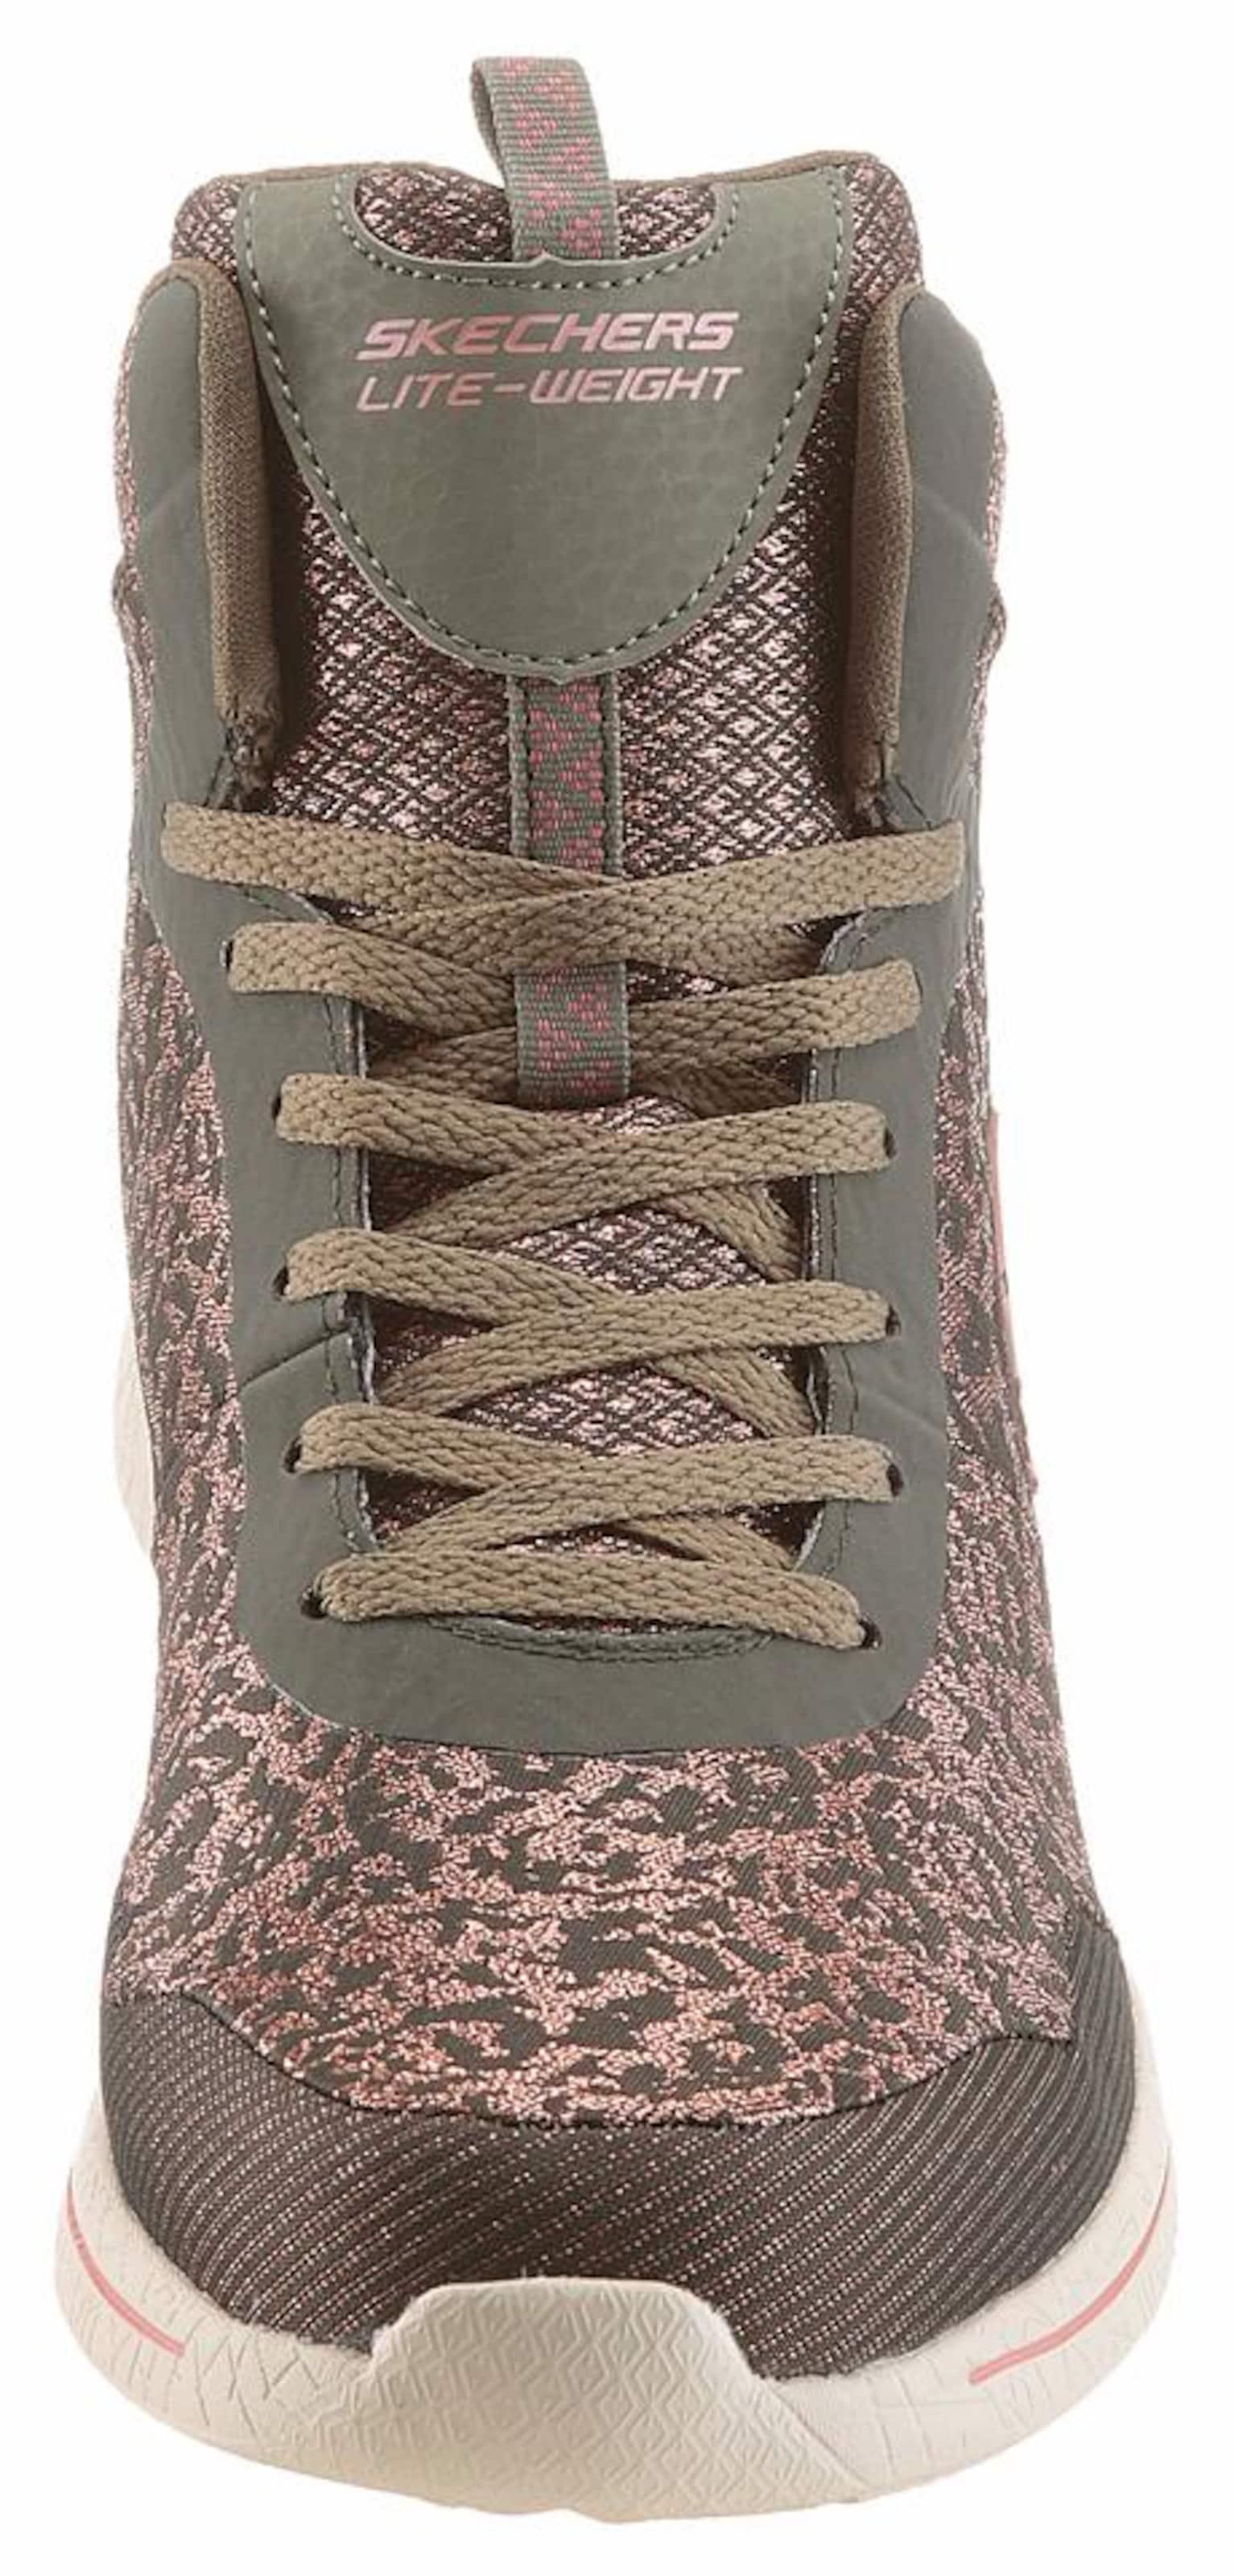 Skechers 2 Forwad' In Fashion 'burst 0 BraunmeliertBronze Sneaker Oliv v08wNymnO